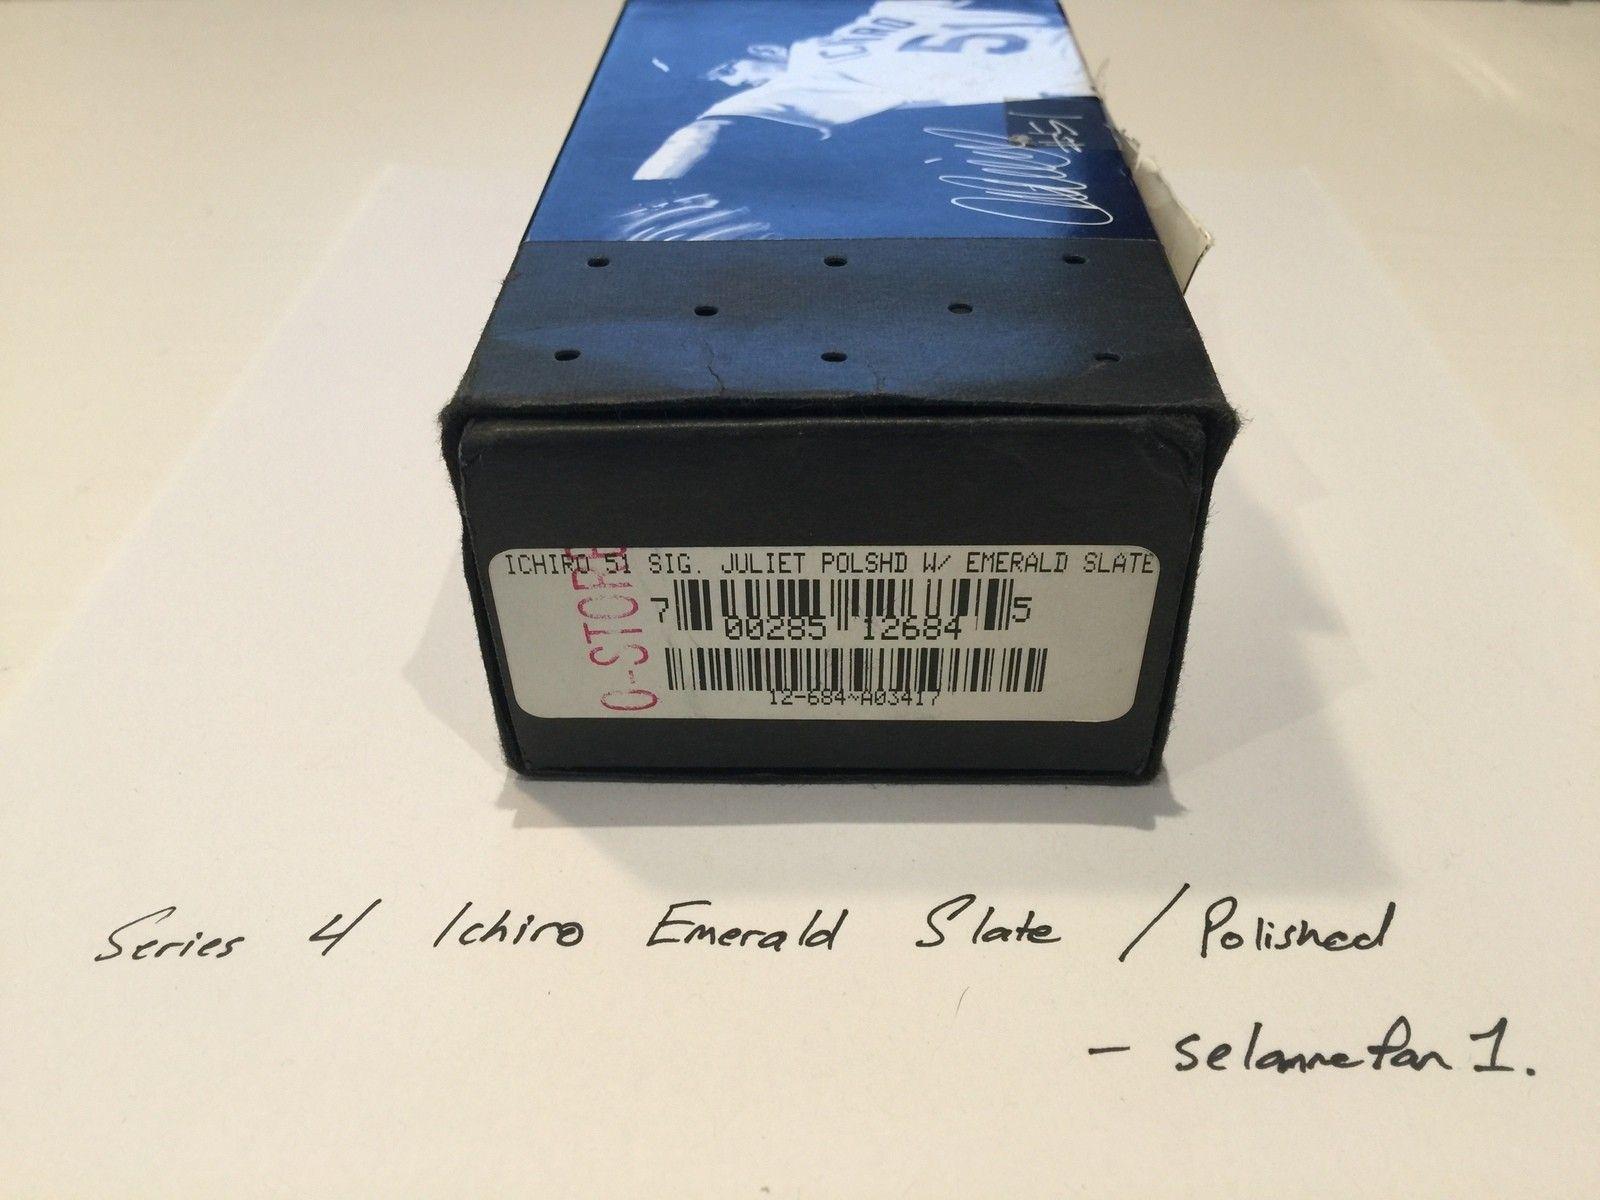 Ichiro Emerald Slate / Polished Frame Juliets (with box) - IMG_3823.JPG